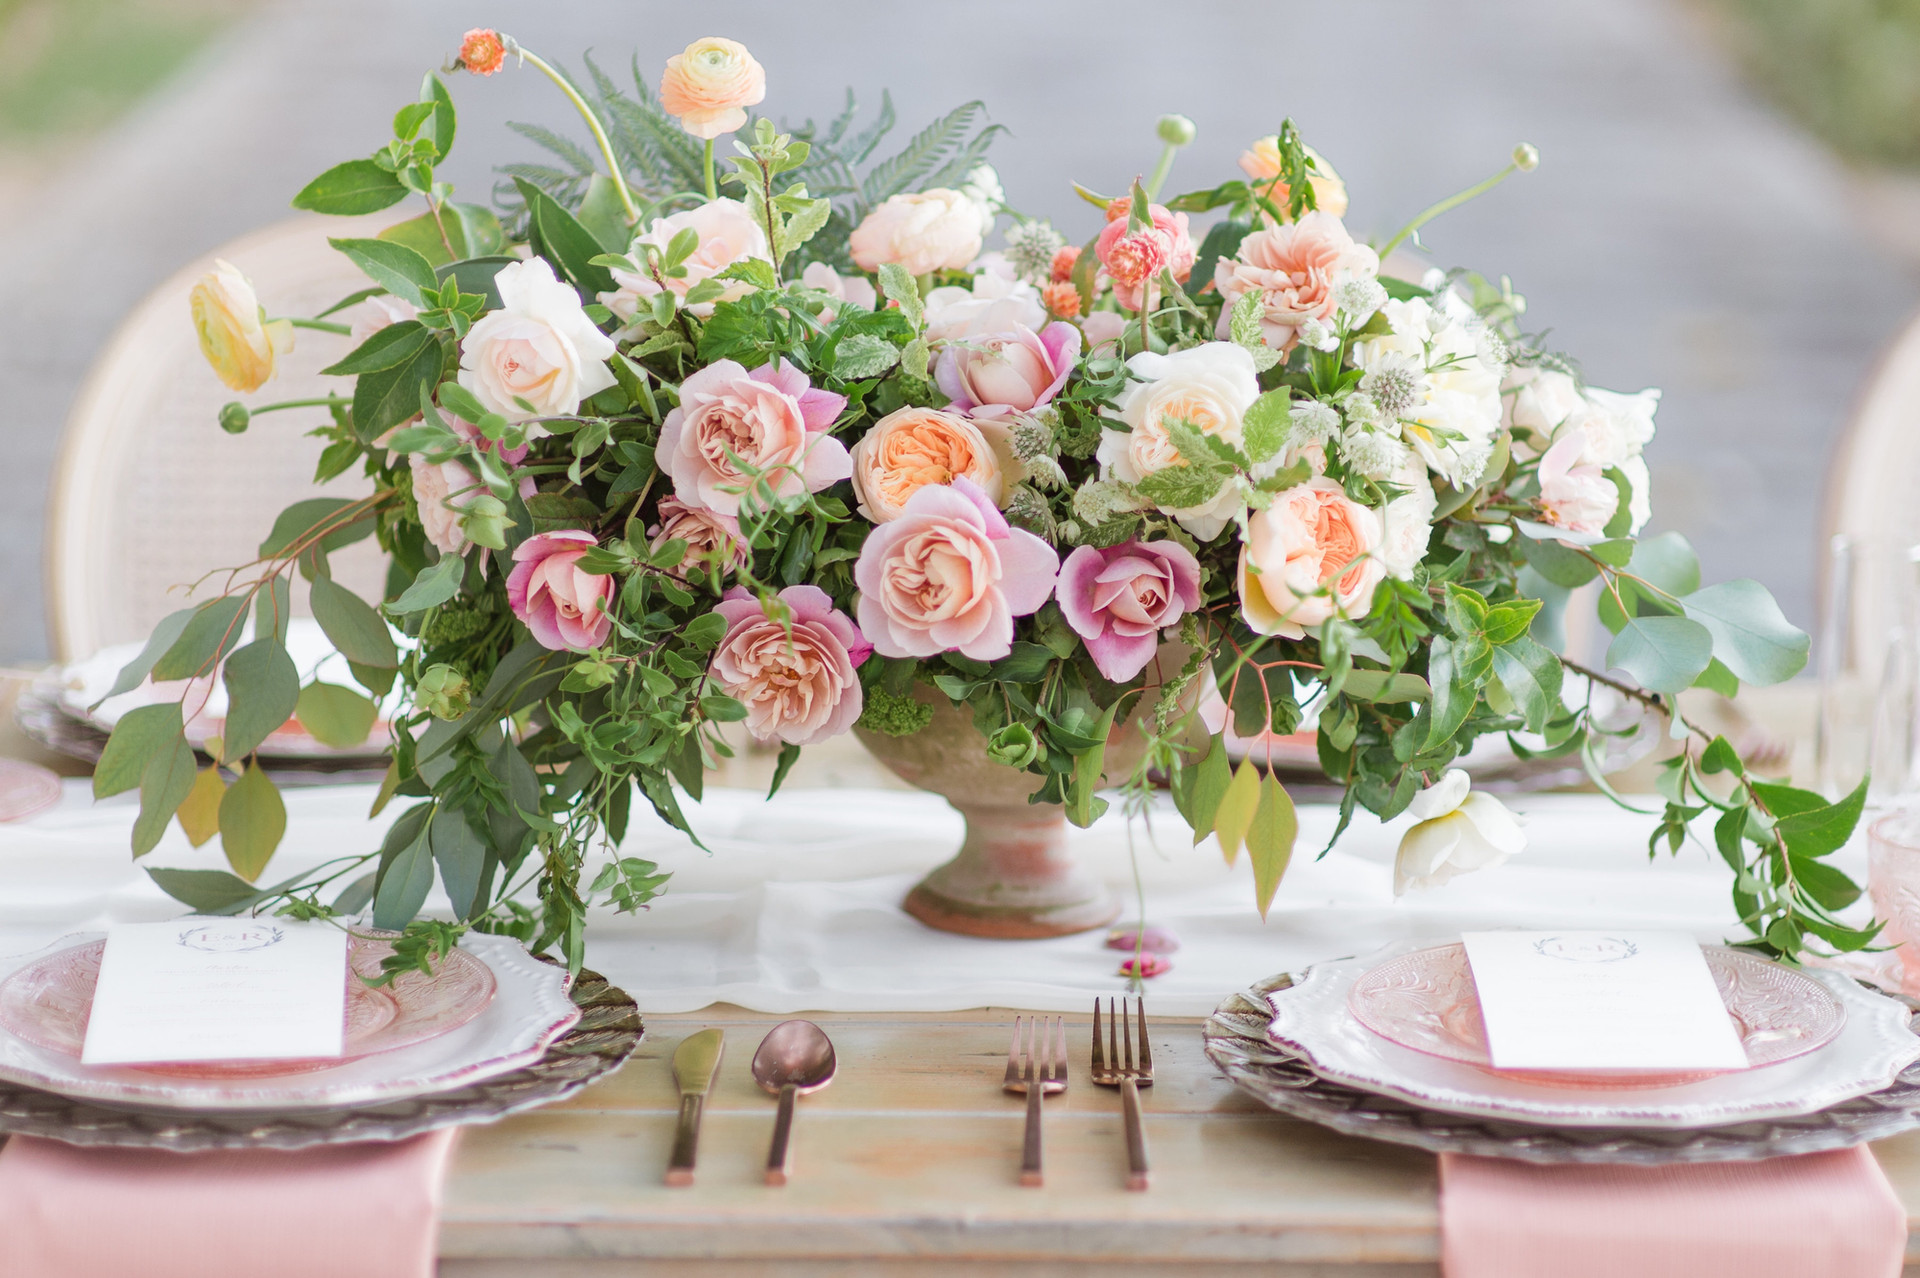 Garden-style centerpiece with ranunculus, garden roses, ferns and garden greenery. Photo: Chelsea Nicole